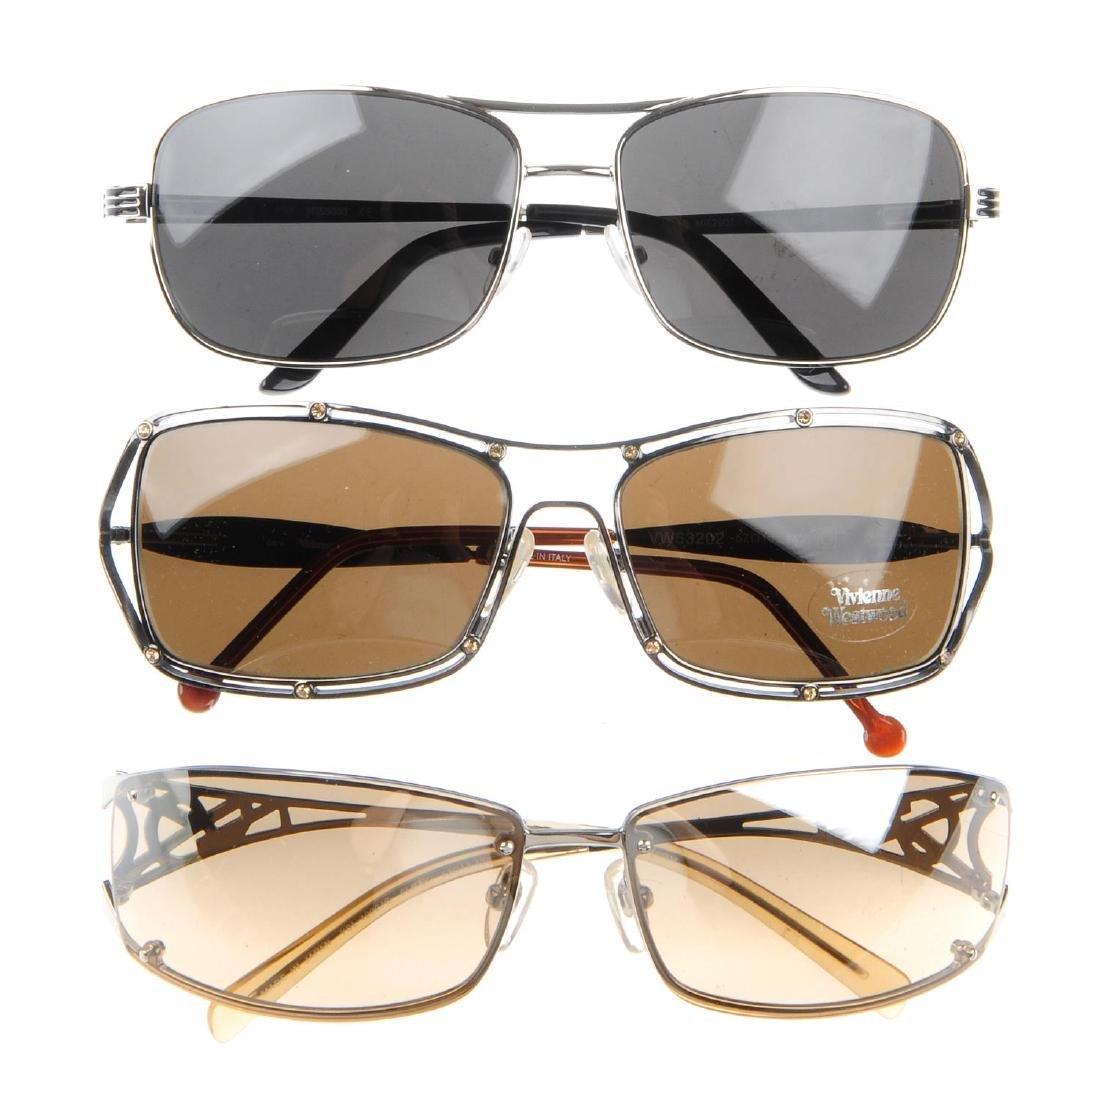 Three pairs of designer sunglasses. To include a pair